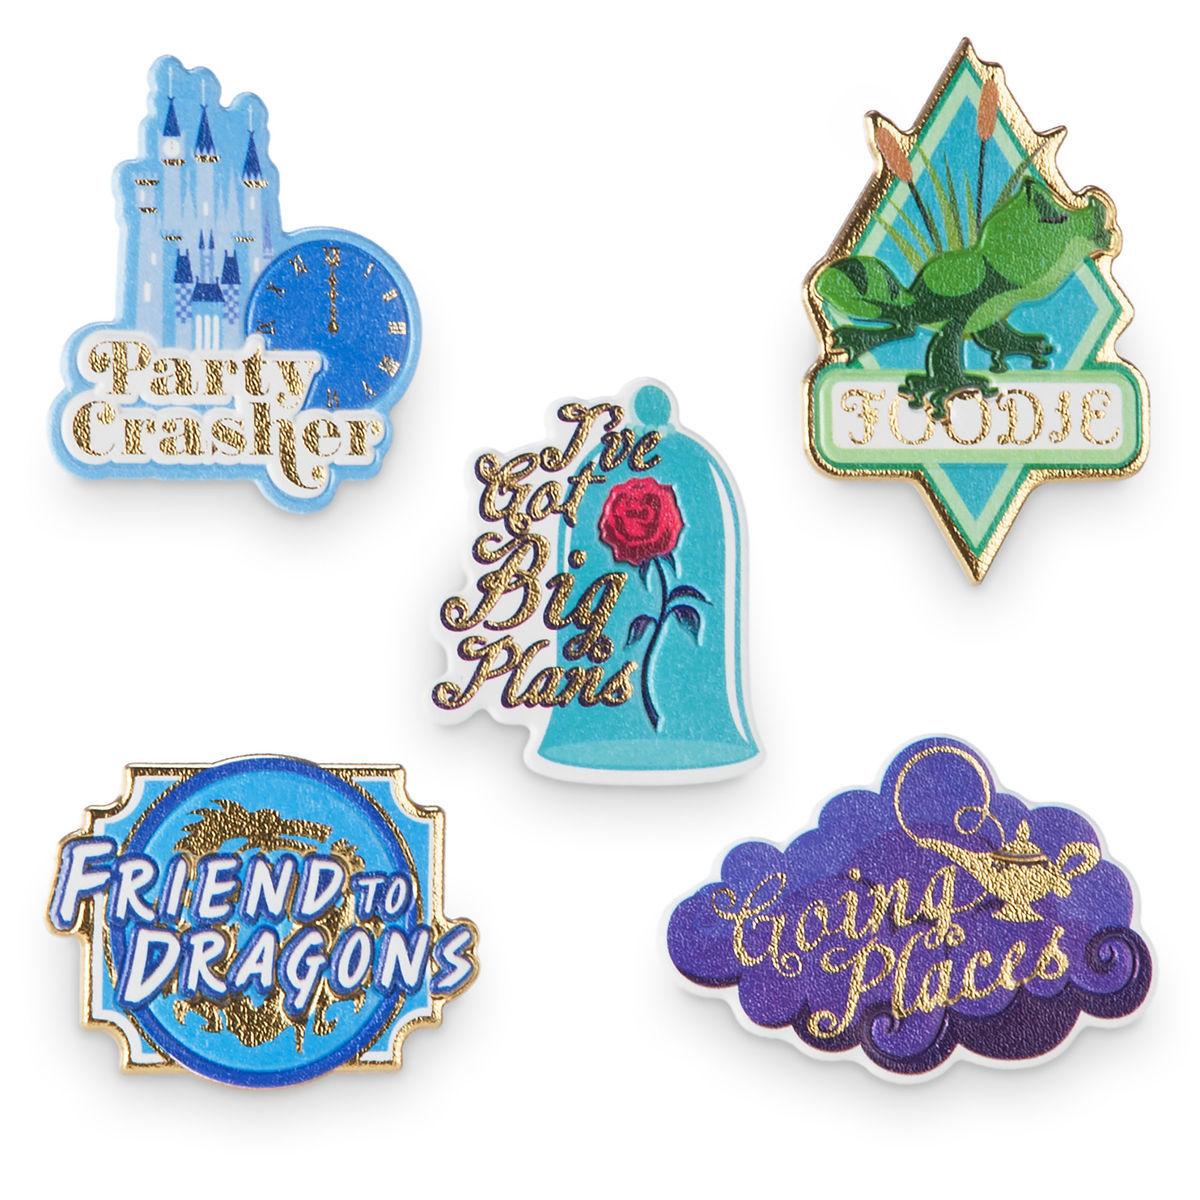 back to school supplies best disney merchandise princesses adhesive patches set